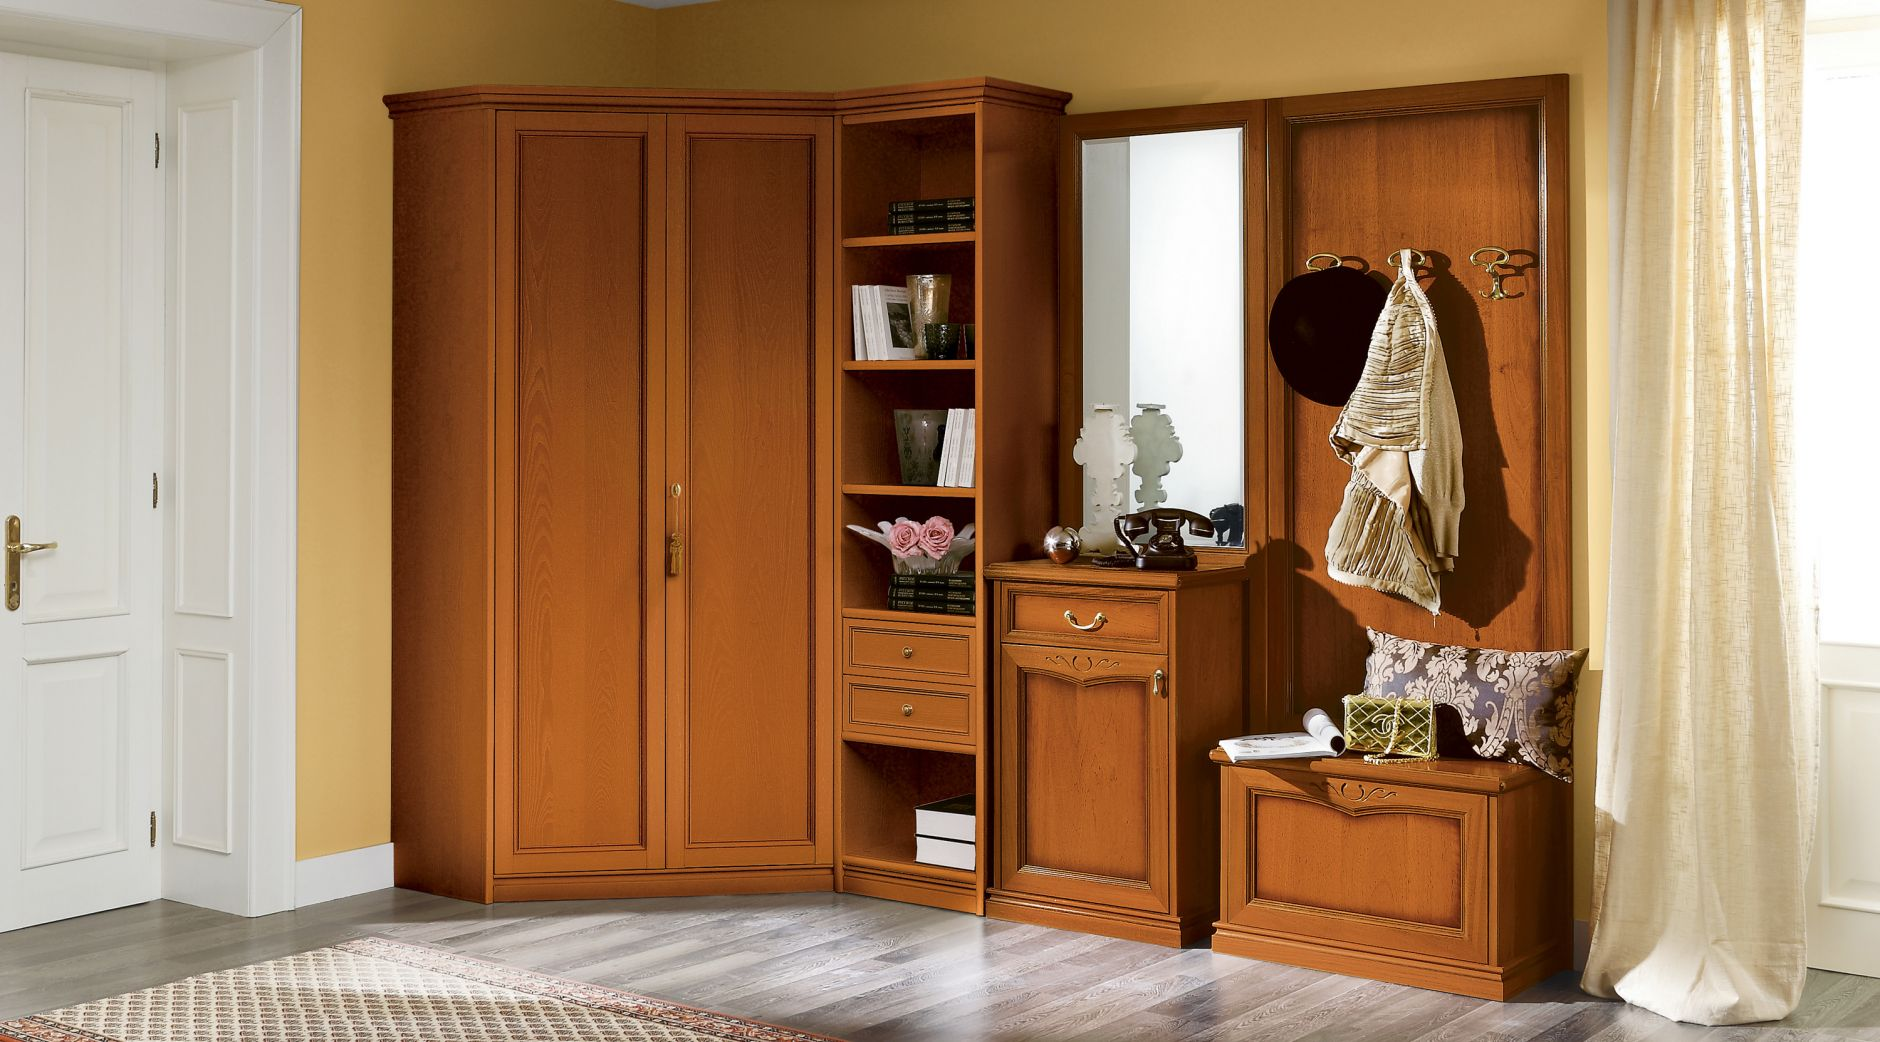 m bel f r korridore m bel f r korridore camelgroup serie. Black Bedroom Furniture Sets. Home Design Ideas